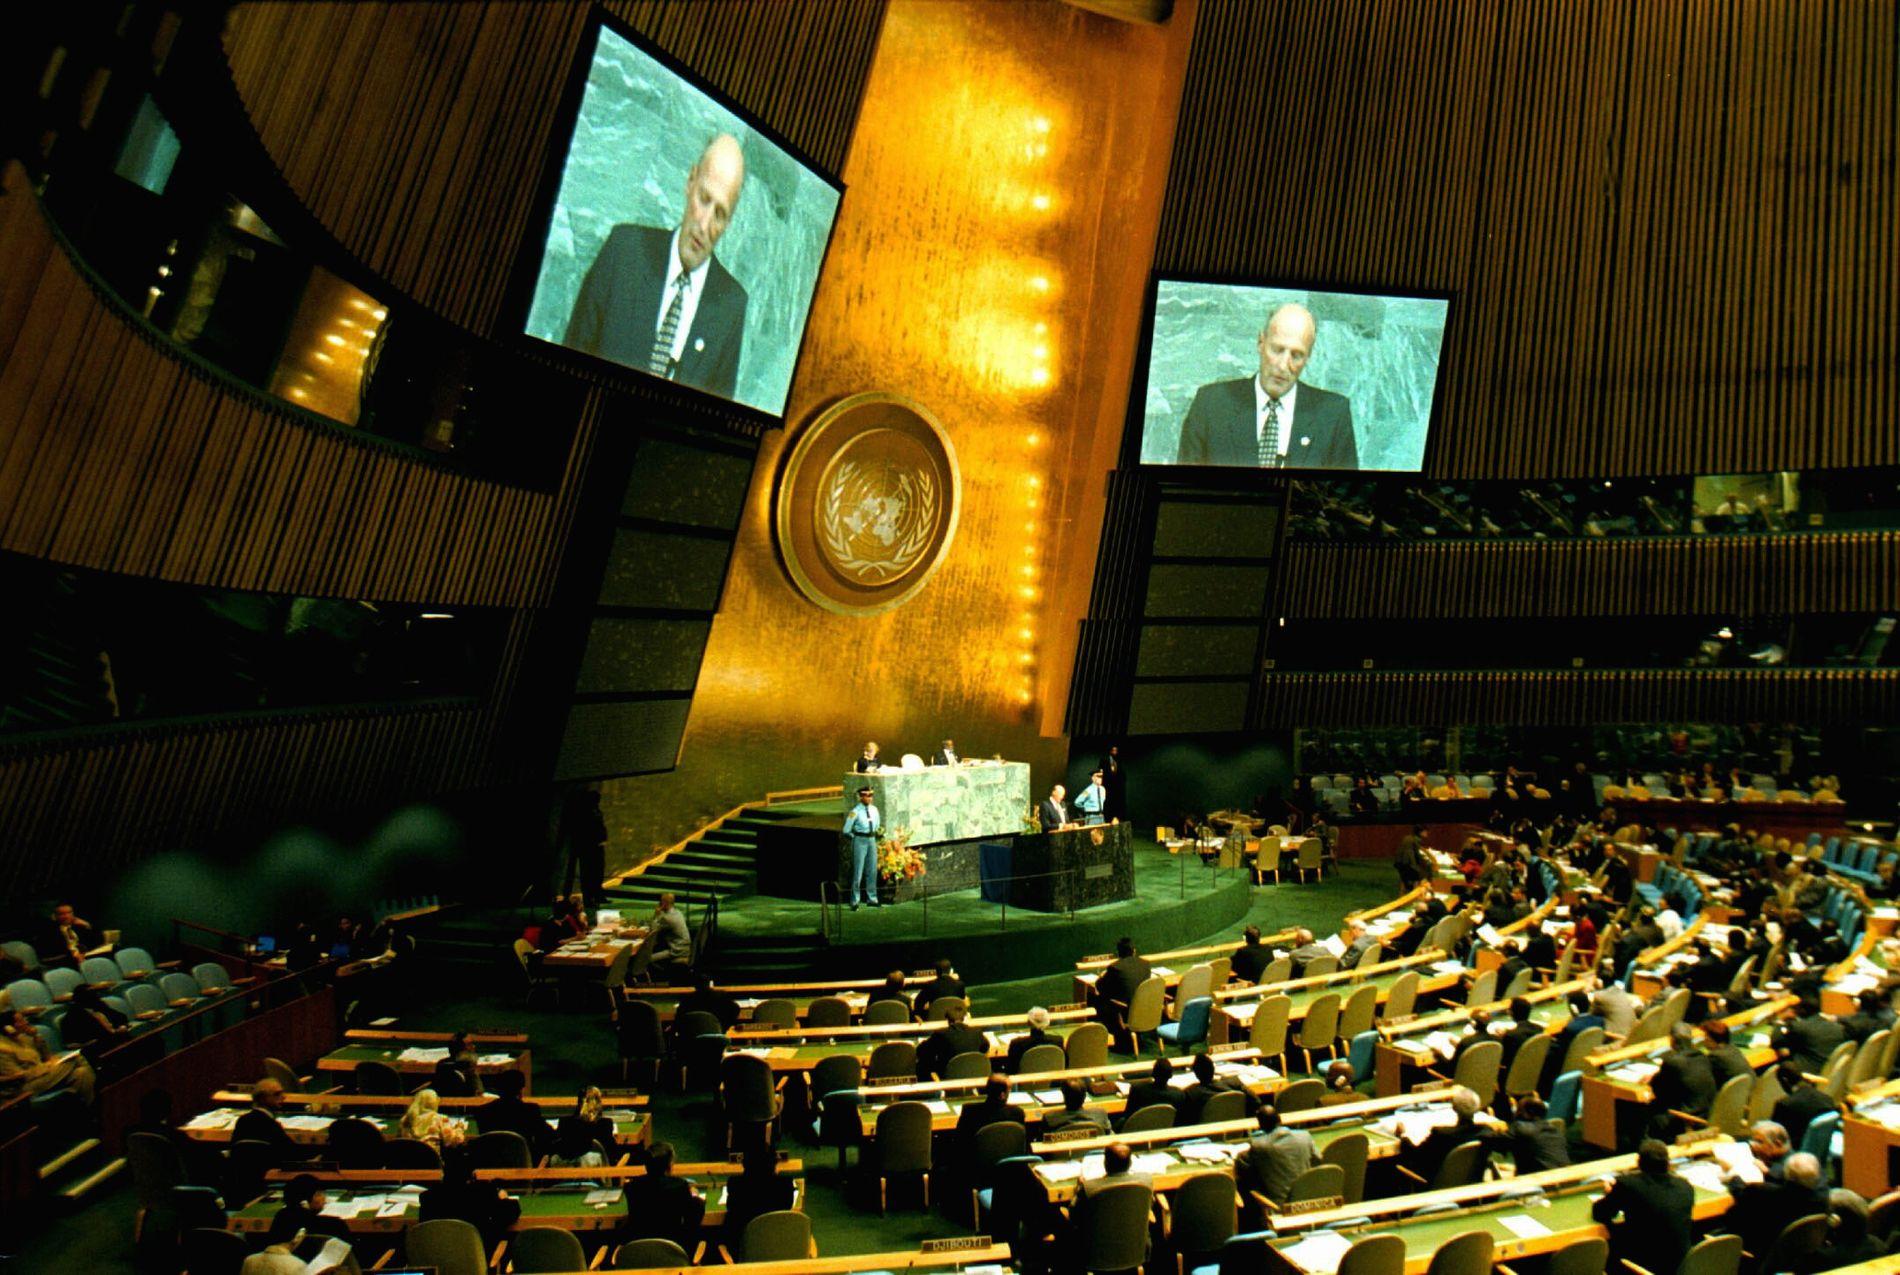 FØRSTE TALE: Kong Harald taler om FNs tusenårsmål under generalforsamlingen i New York i september 2000.